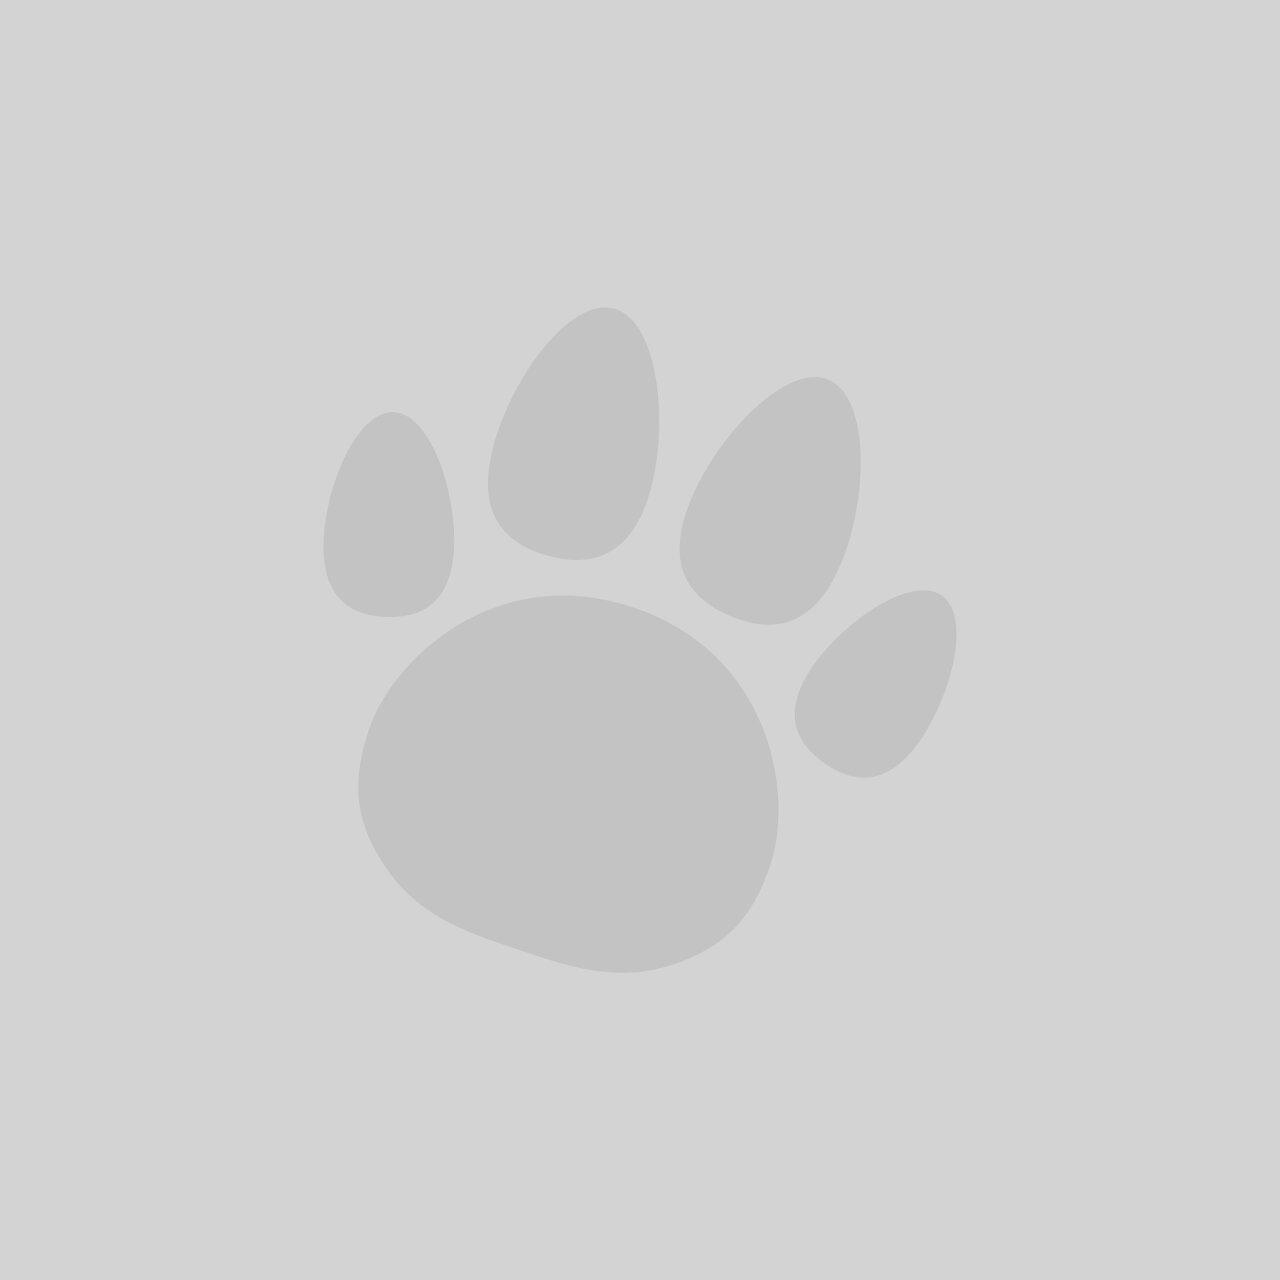 Flexi Classic Retractable Cord Small Dog Lead 5m - Red